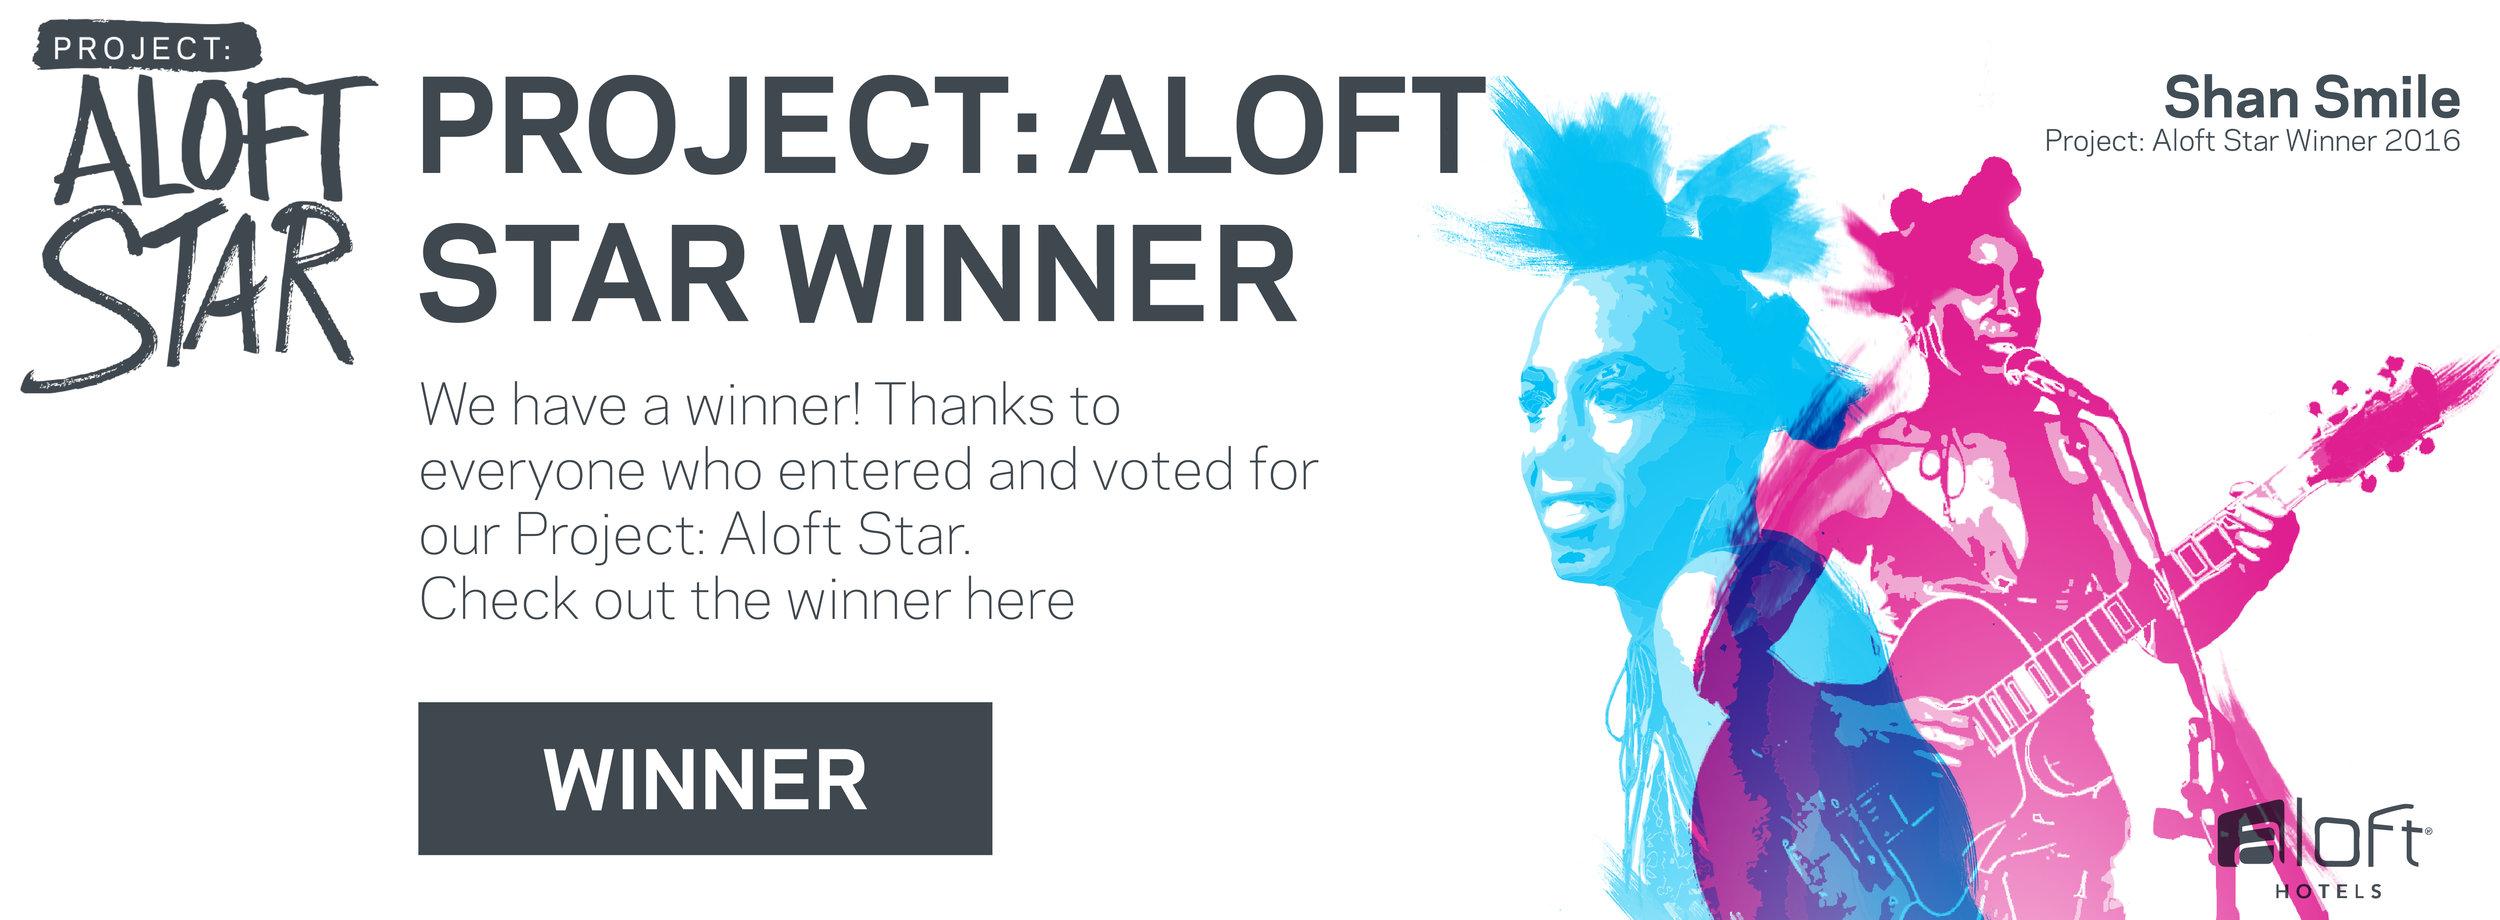 Project Aloft 2017_Votigo_ Asset 8 -08.jpg